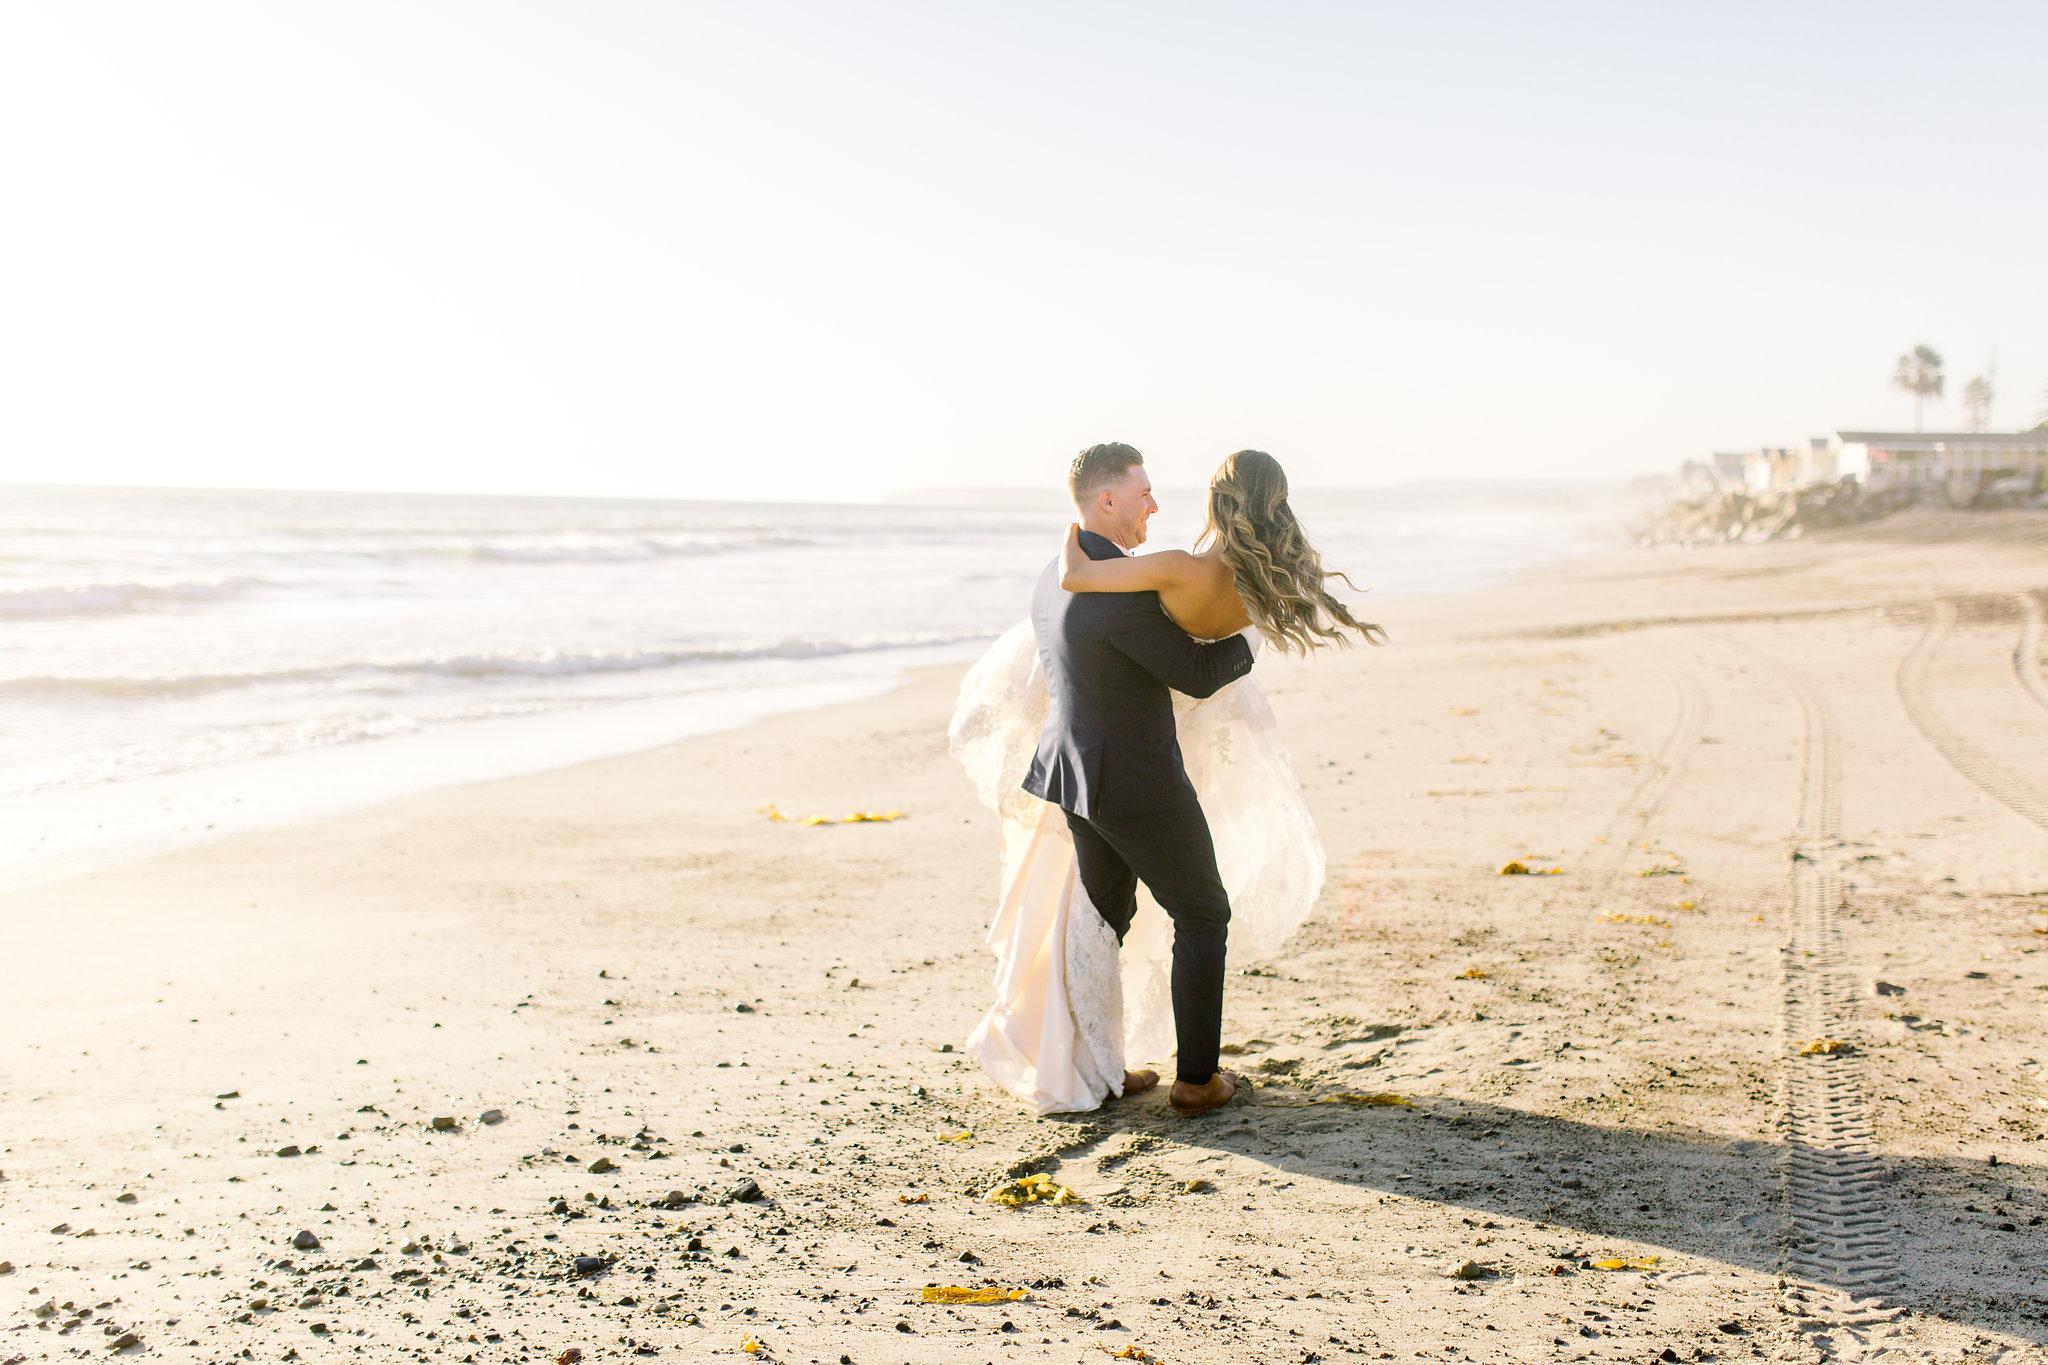 San Clemente, San clemente beach wedding, the casino san clemente, bride and groom portraits, beach portraits, san clemente wedding photo